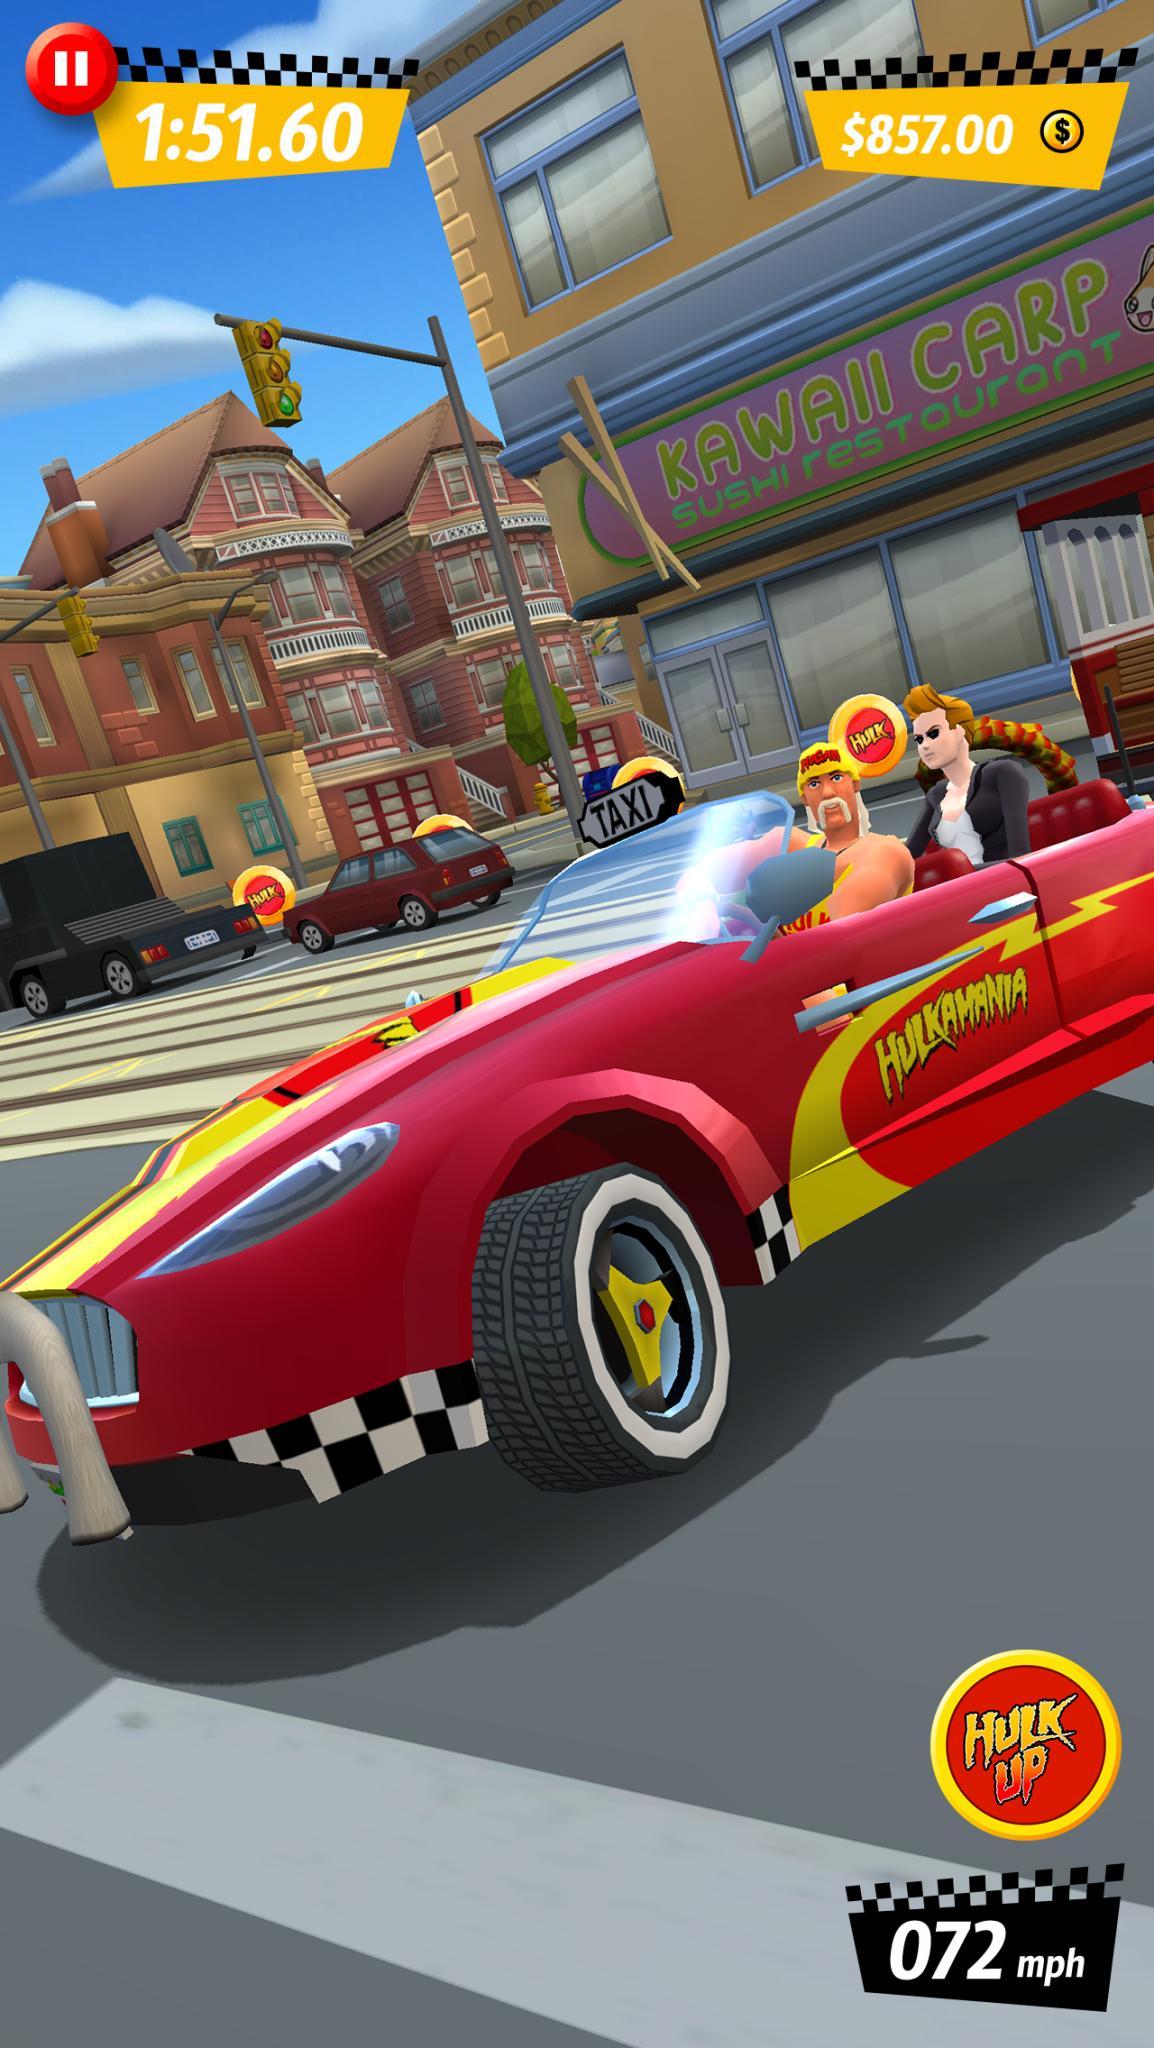 Modojo | Hulk Hogan Joins the Cast of Crazy Taxi: City Rush